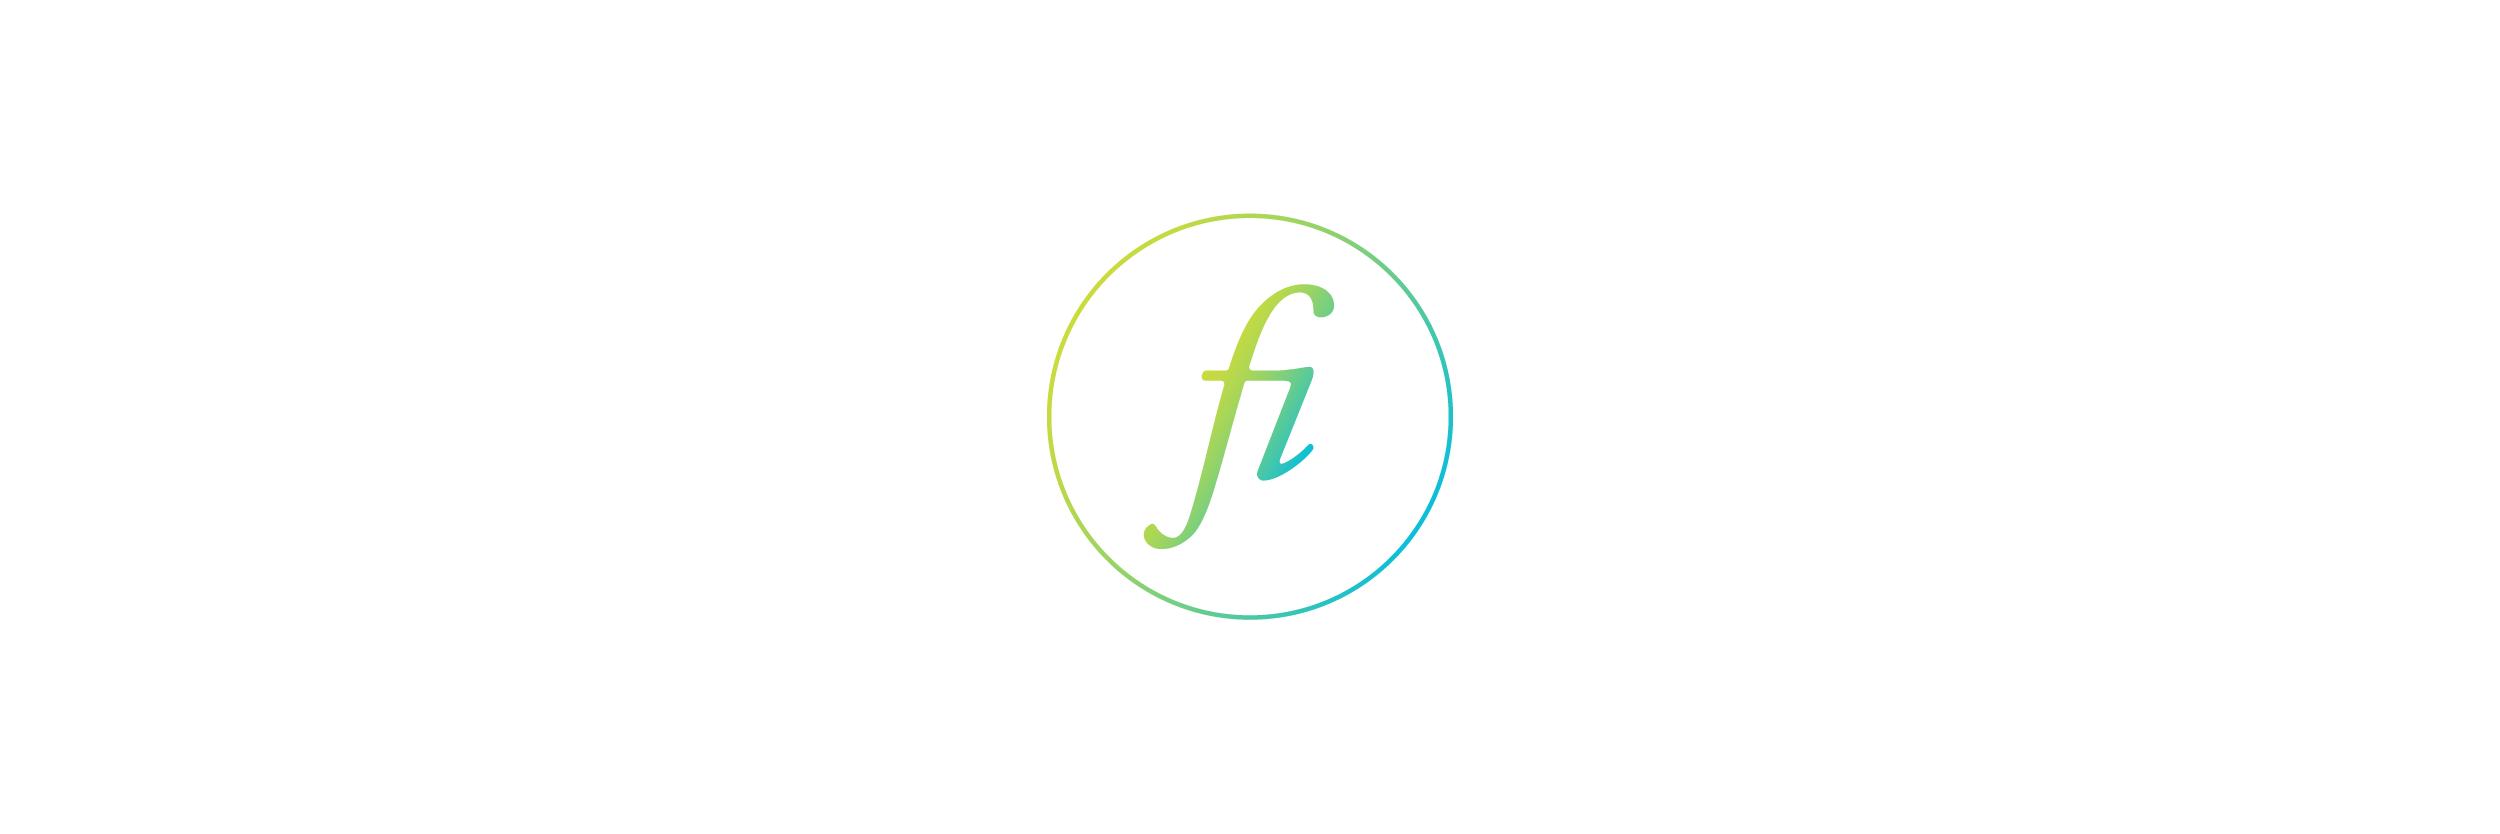 Fi by Filipe Amado